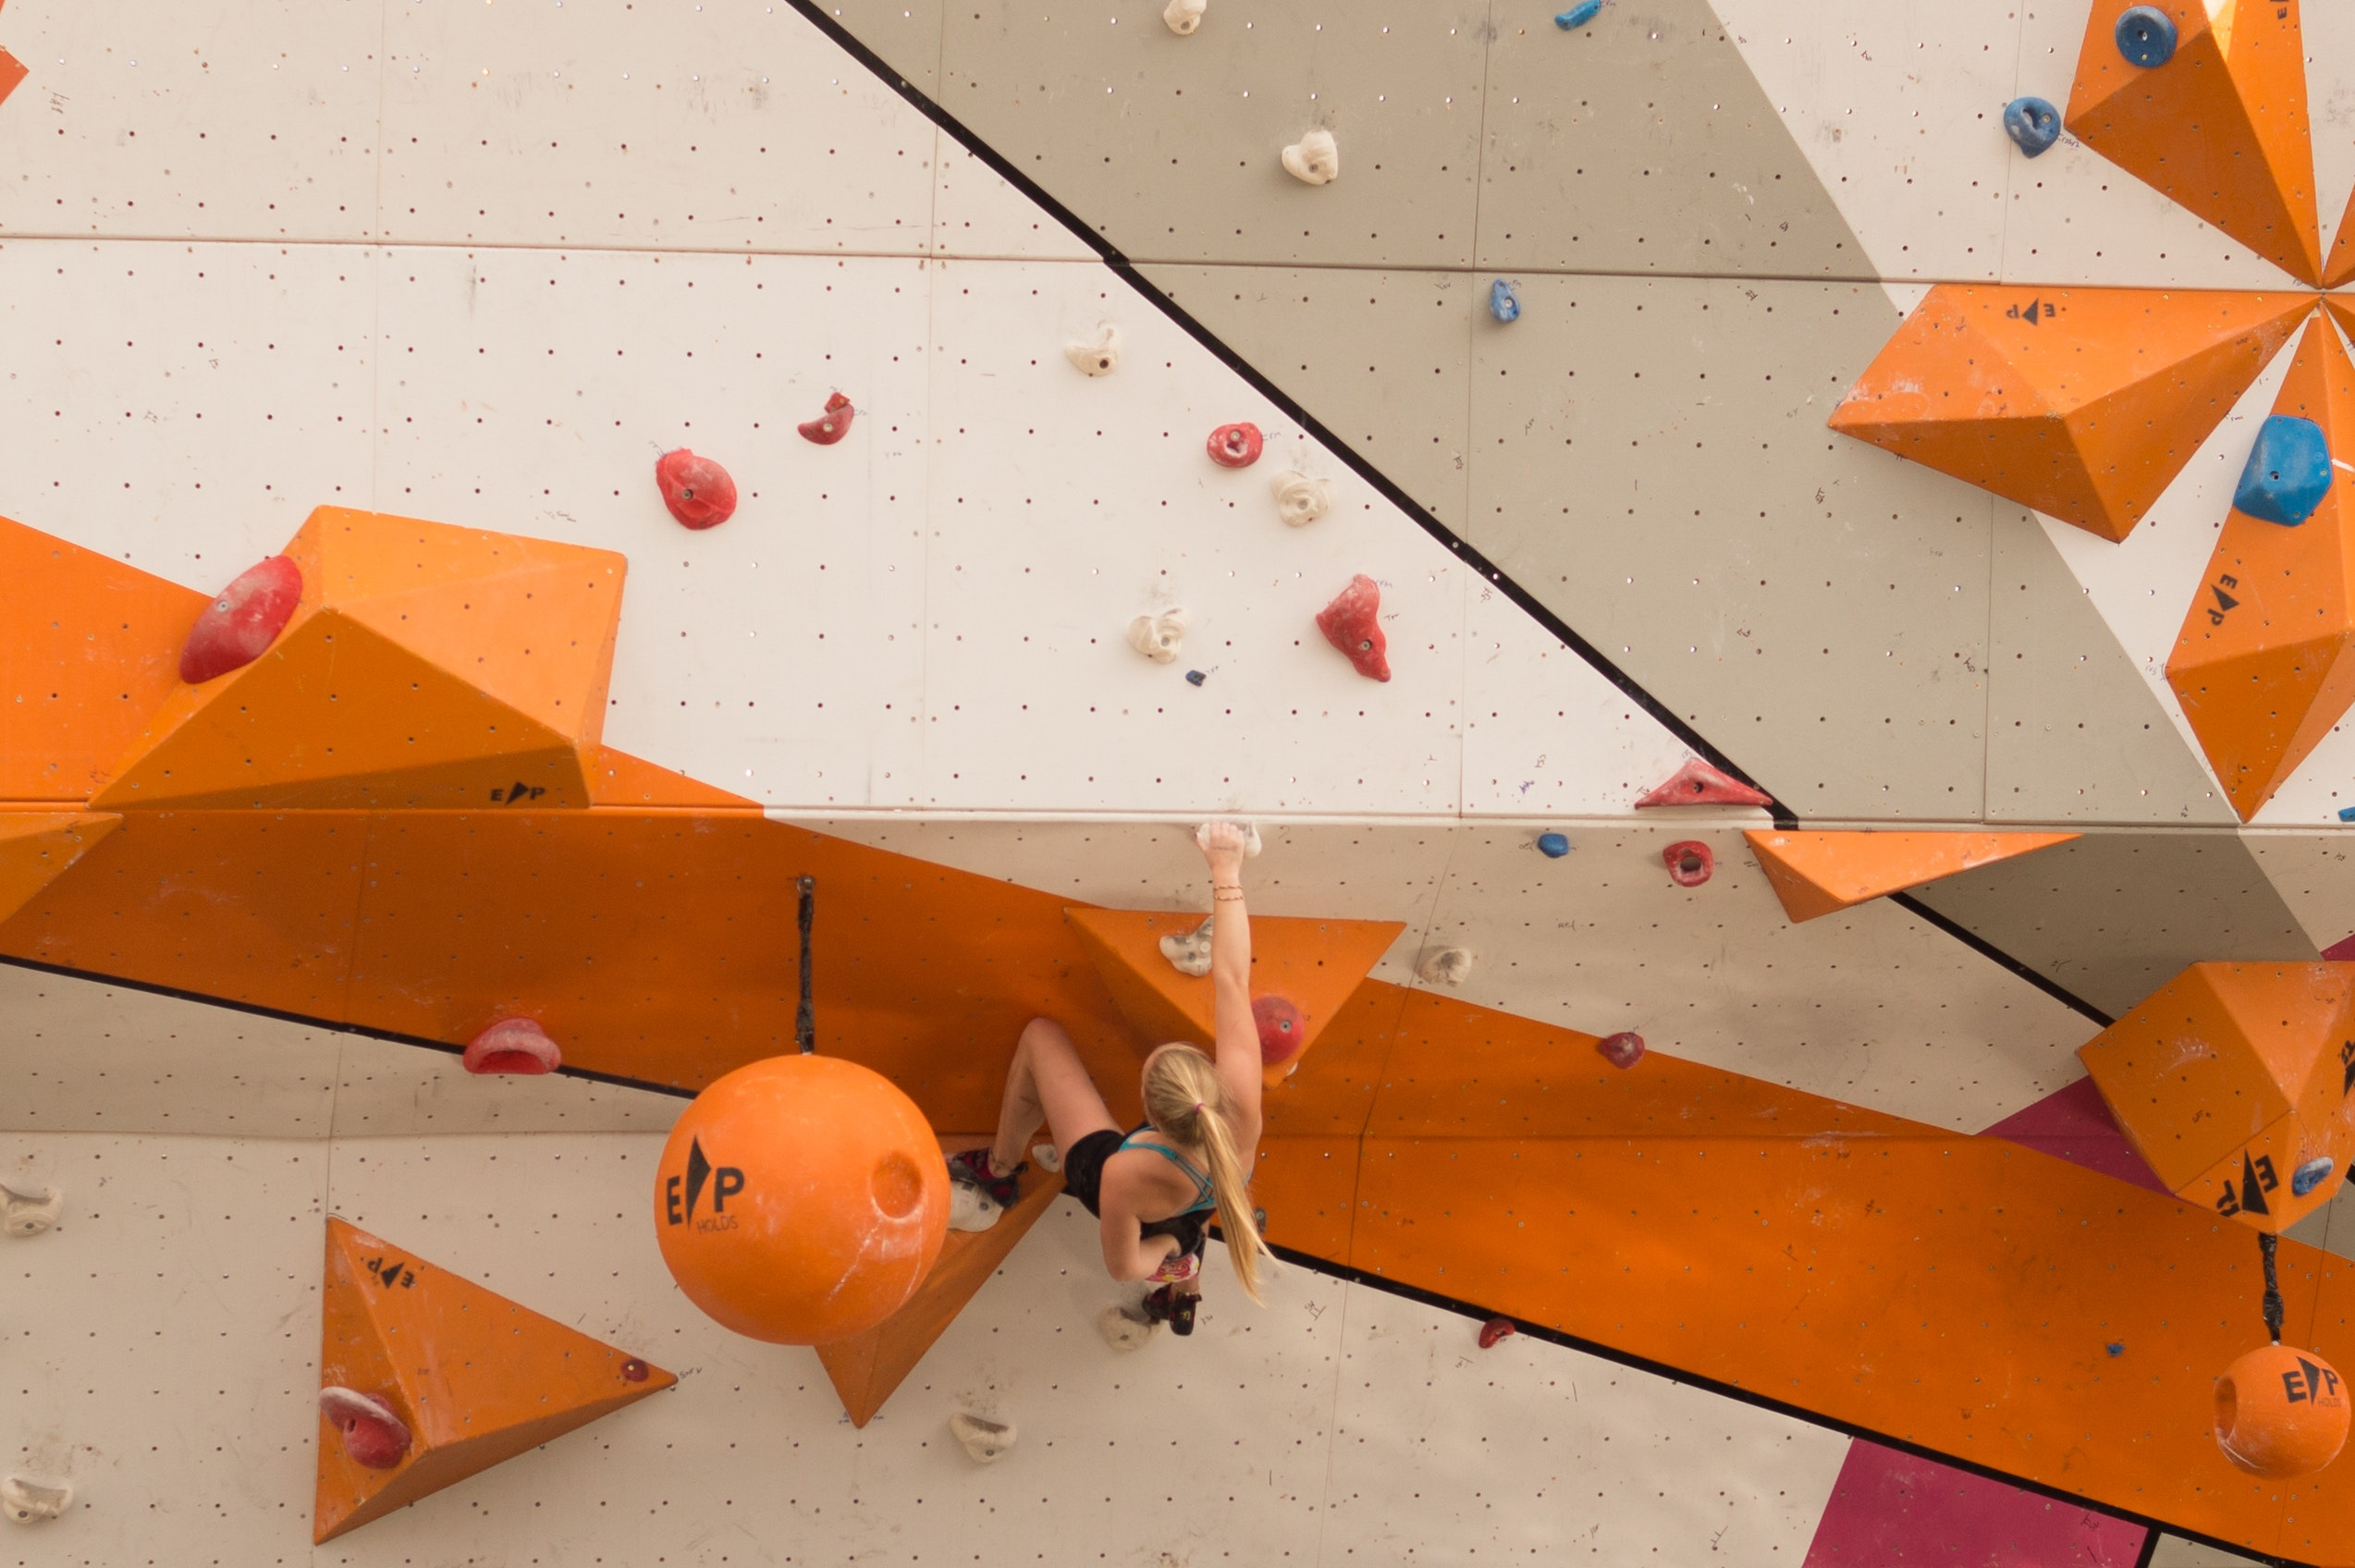 https://gimifun.com/wp-content/uploads/2019/03/bouldering-climber-climbing-9606.jpg